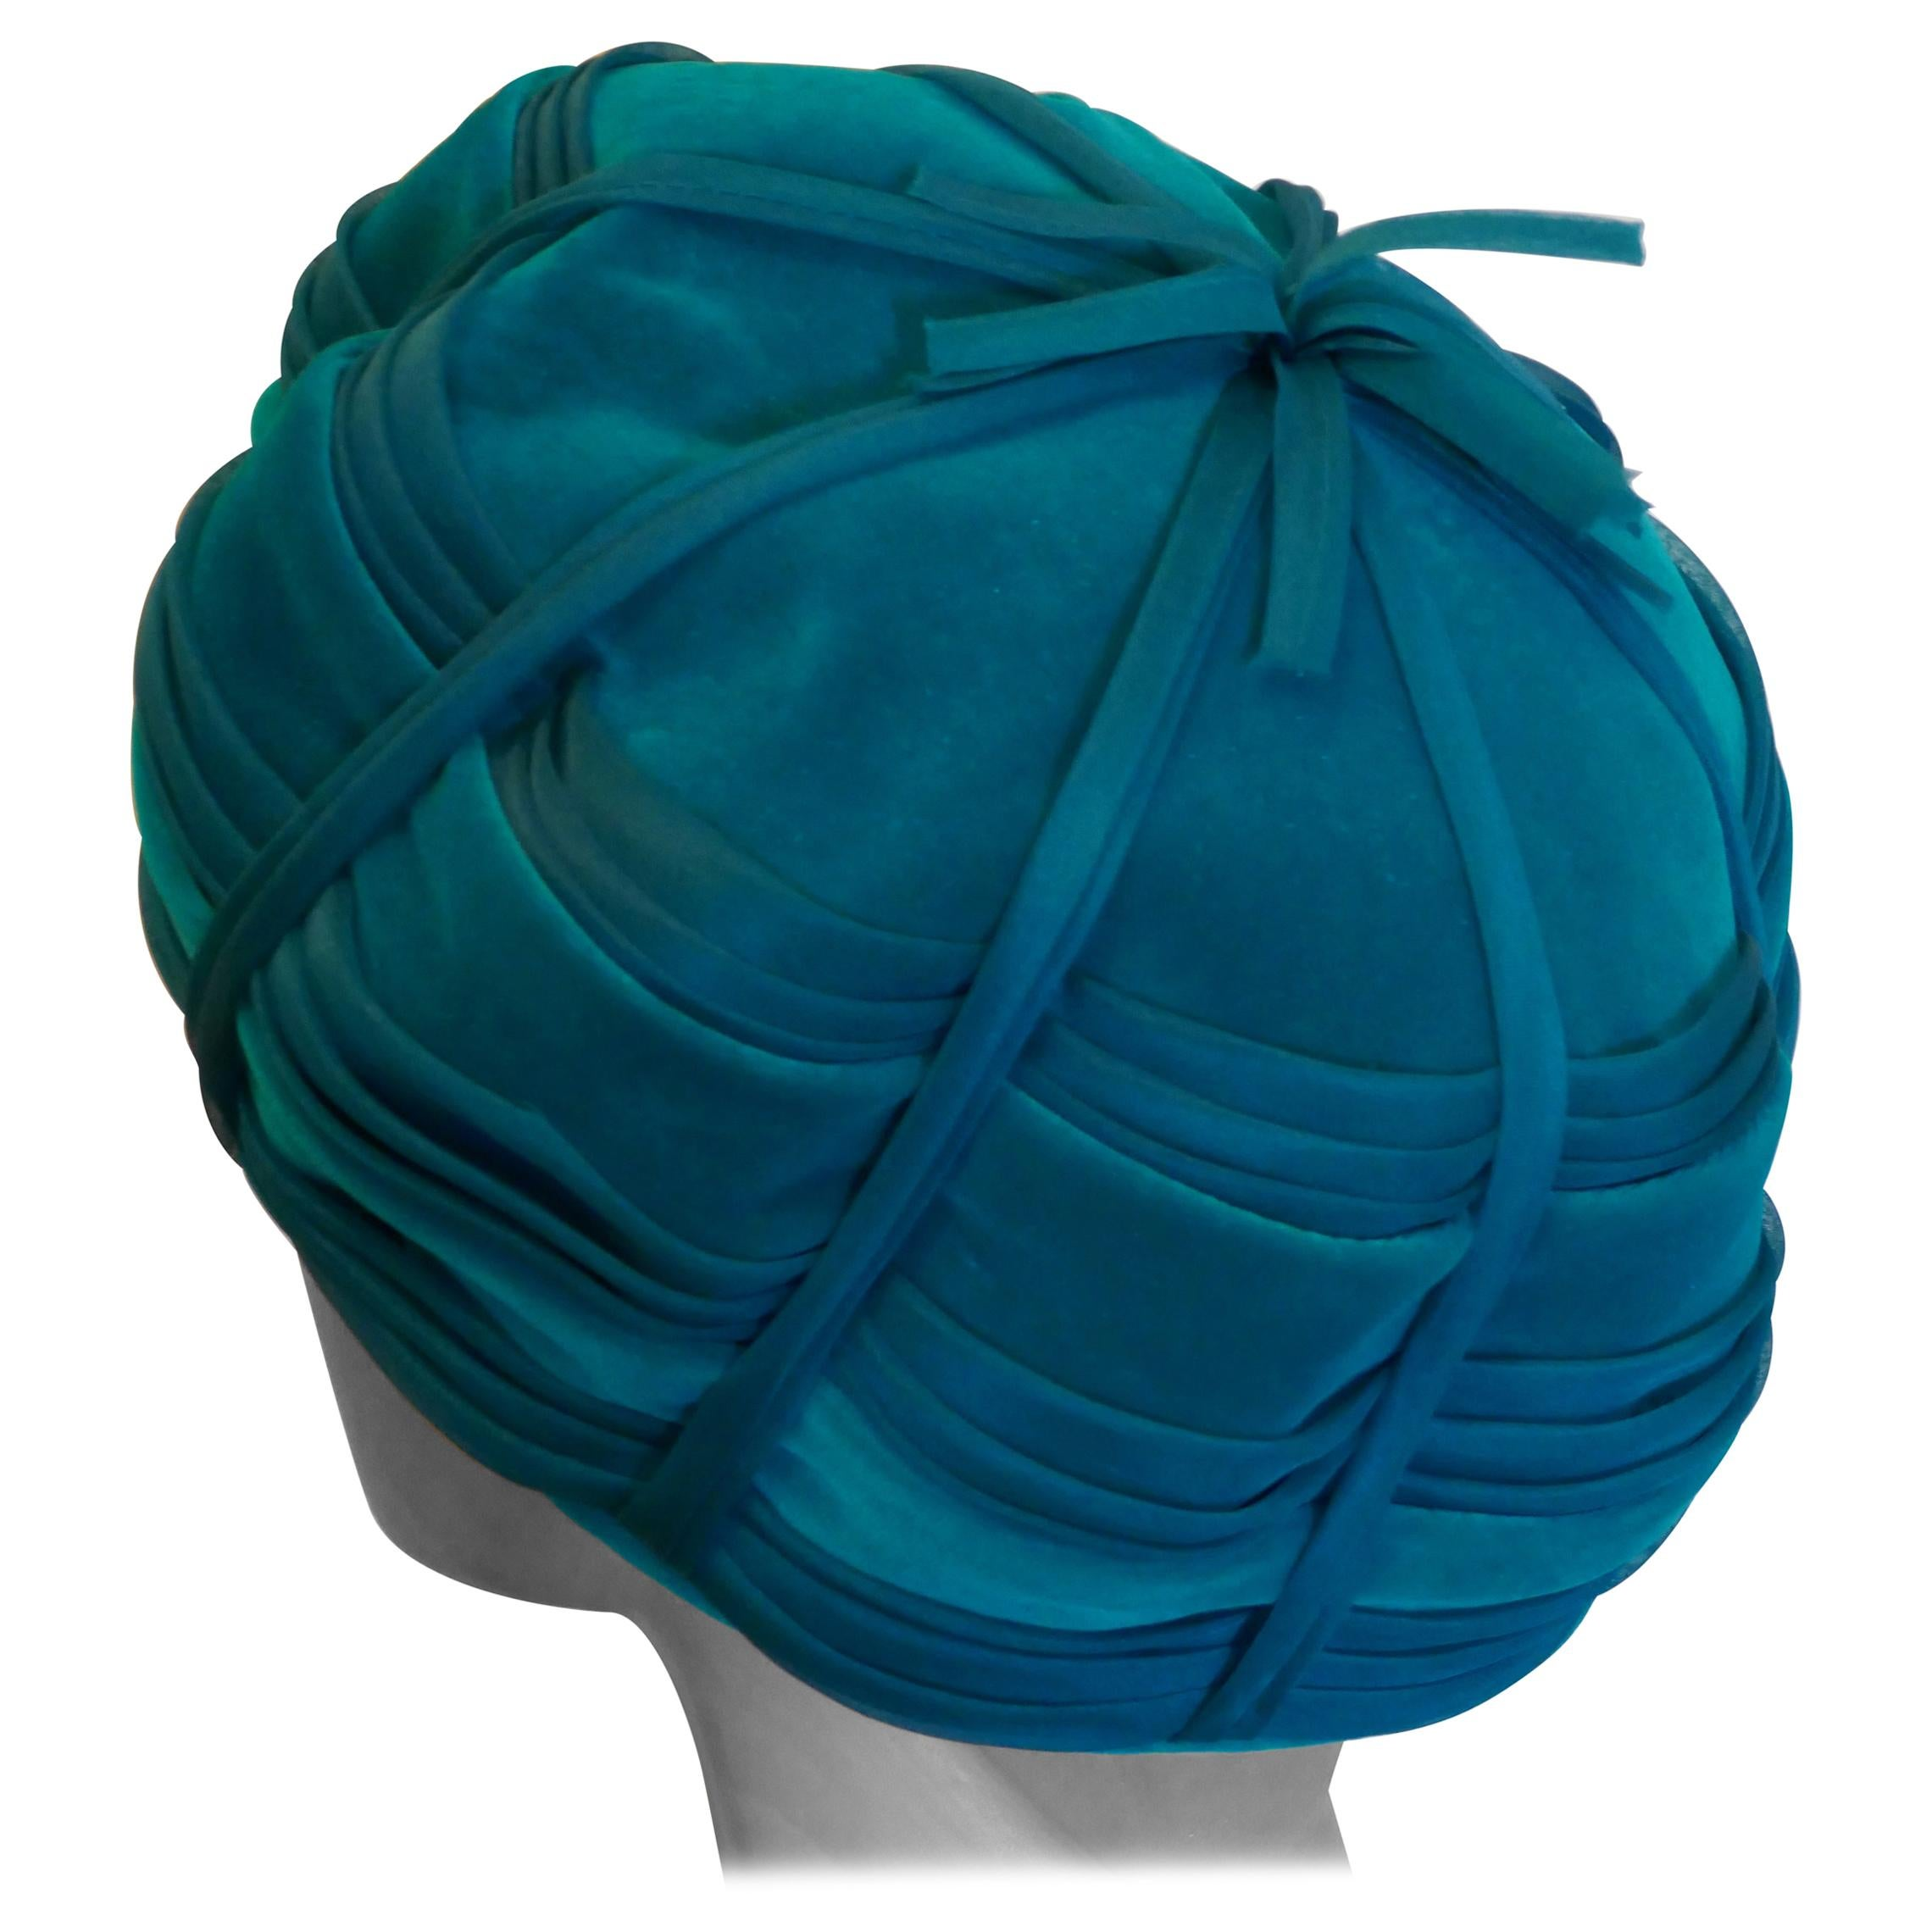 Original 1960s Beret Style Teal Pill Box Hat, Divided Beret